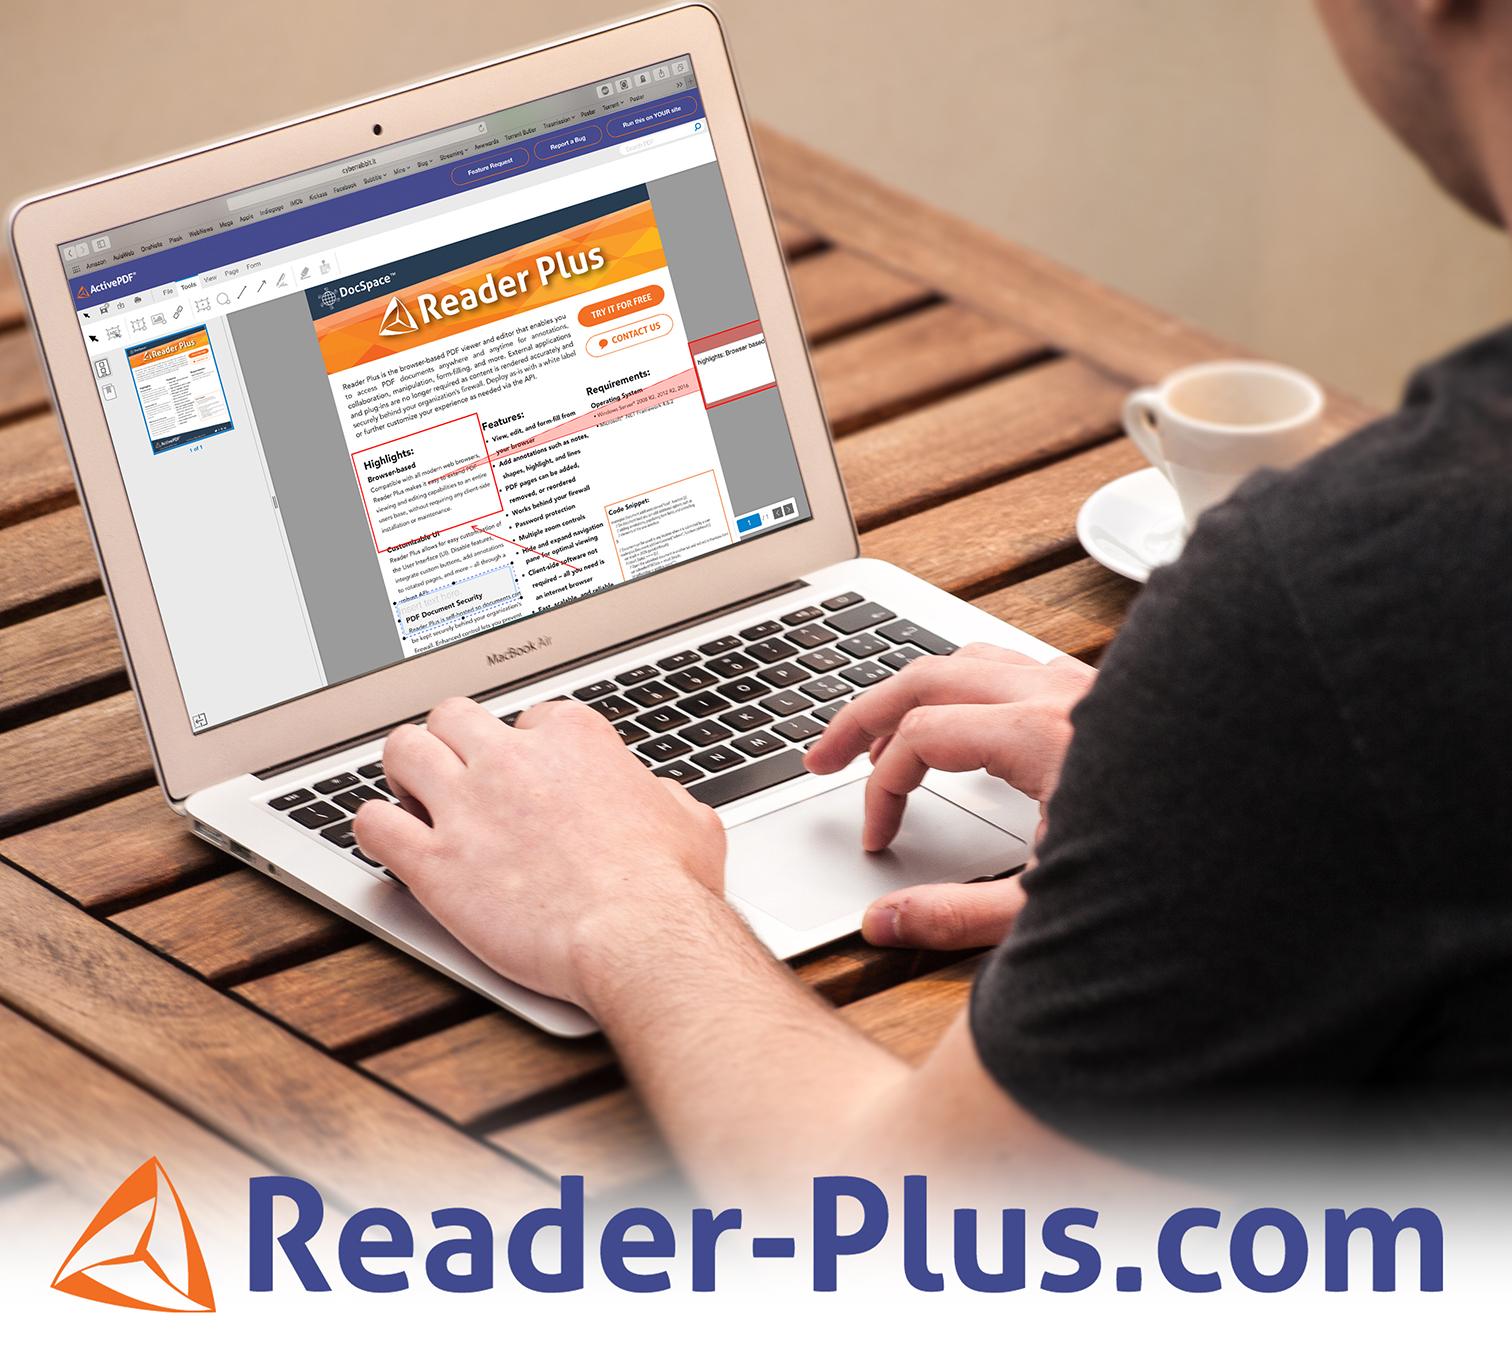 FREE COMPUTER ACTIVE PDF FORM DOWNLOAD